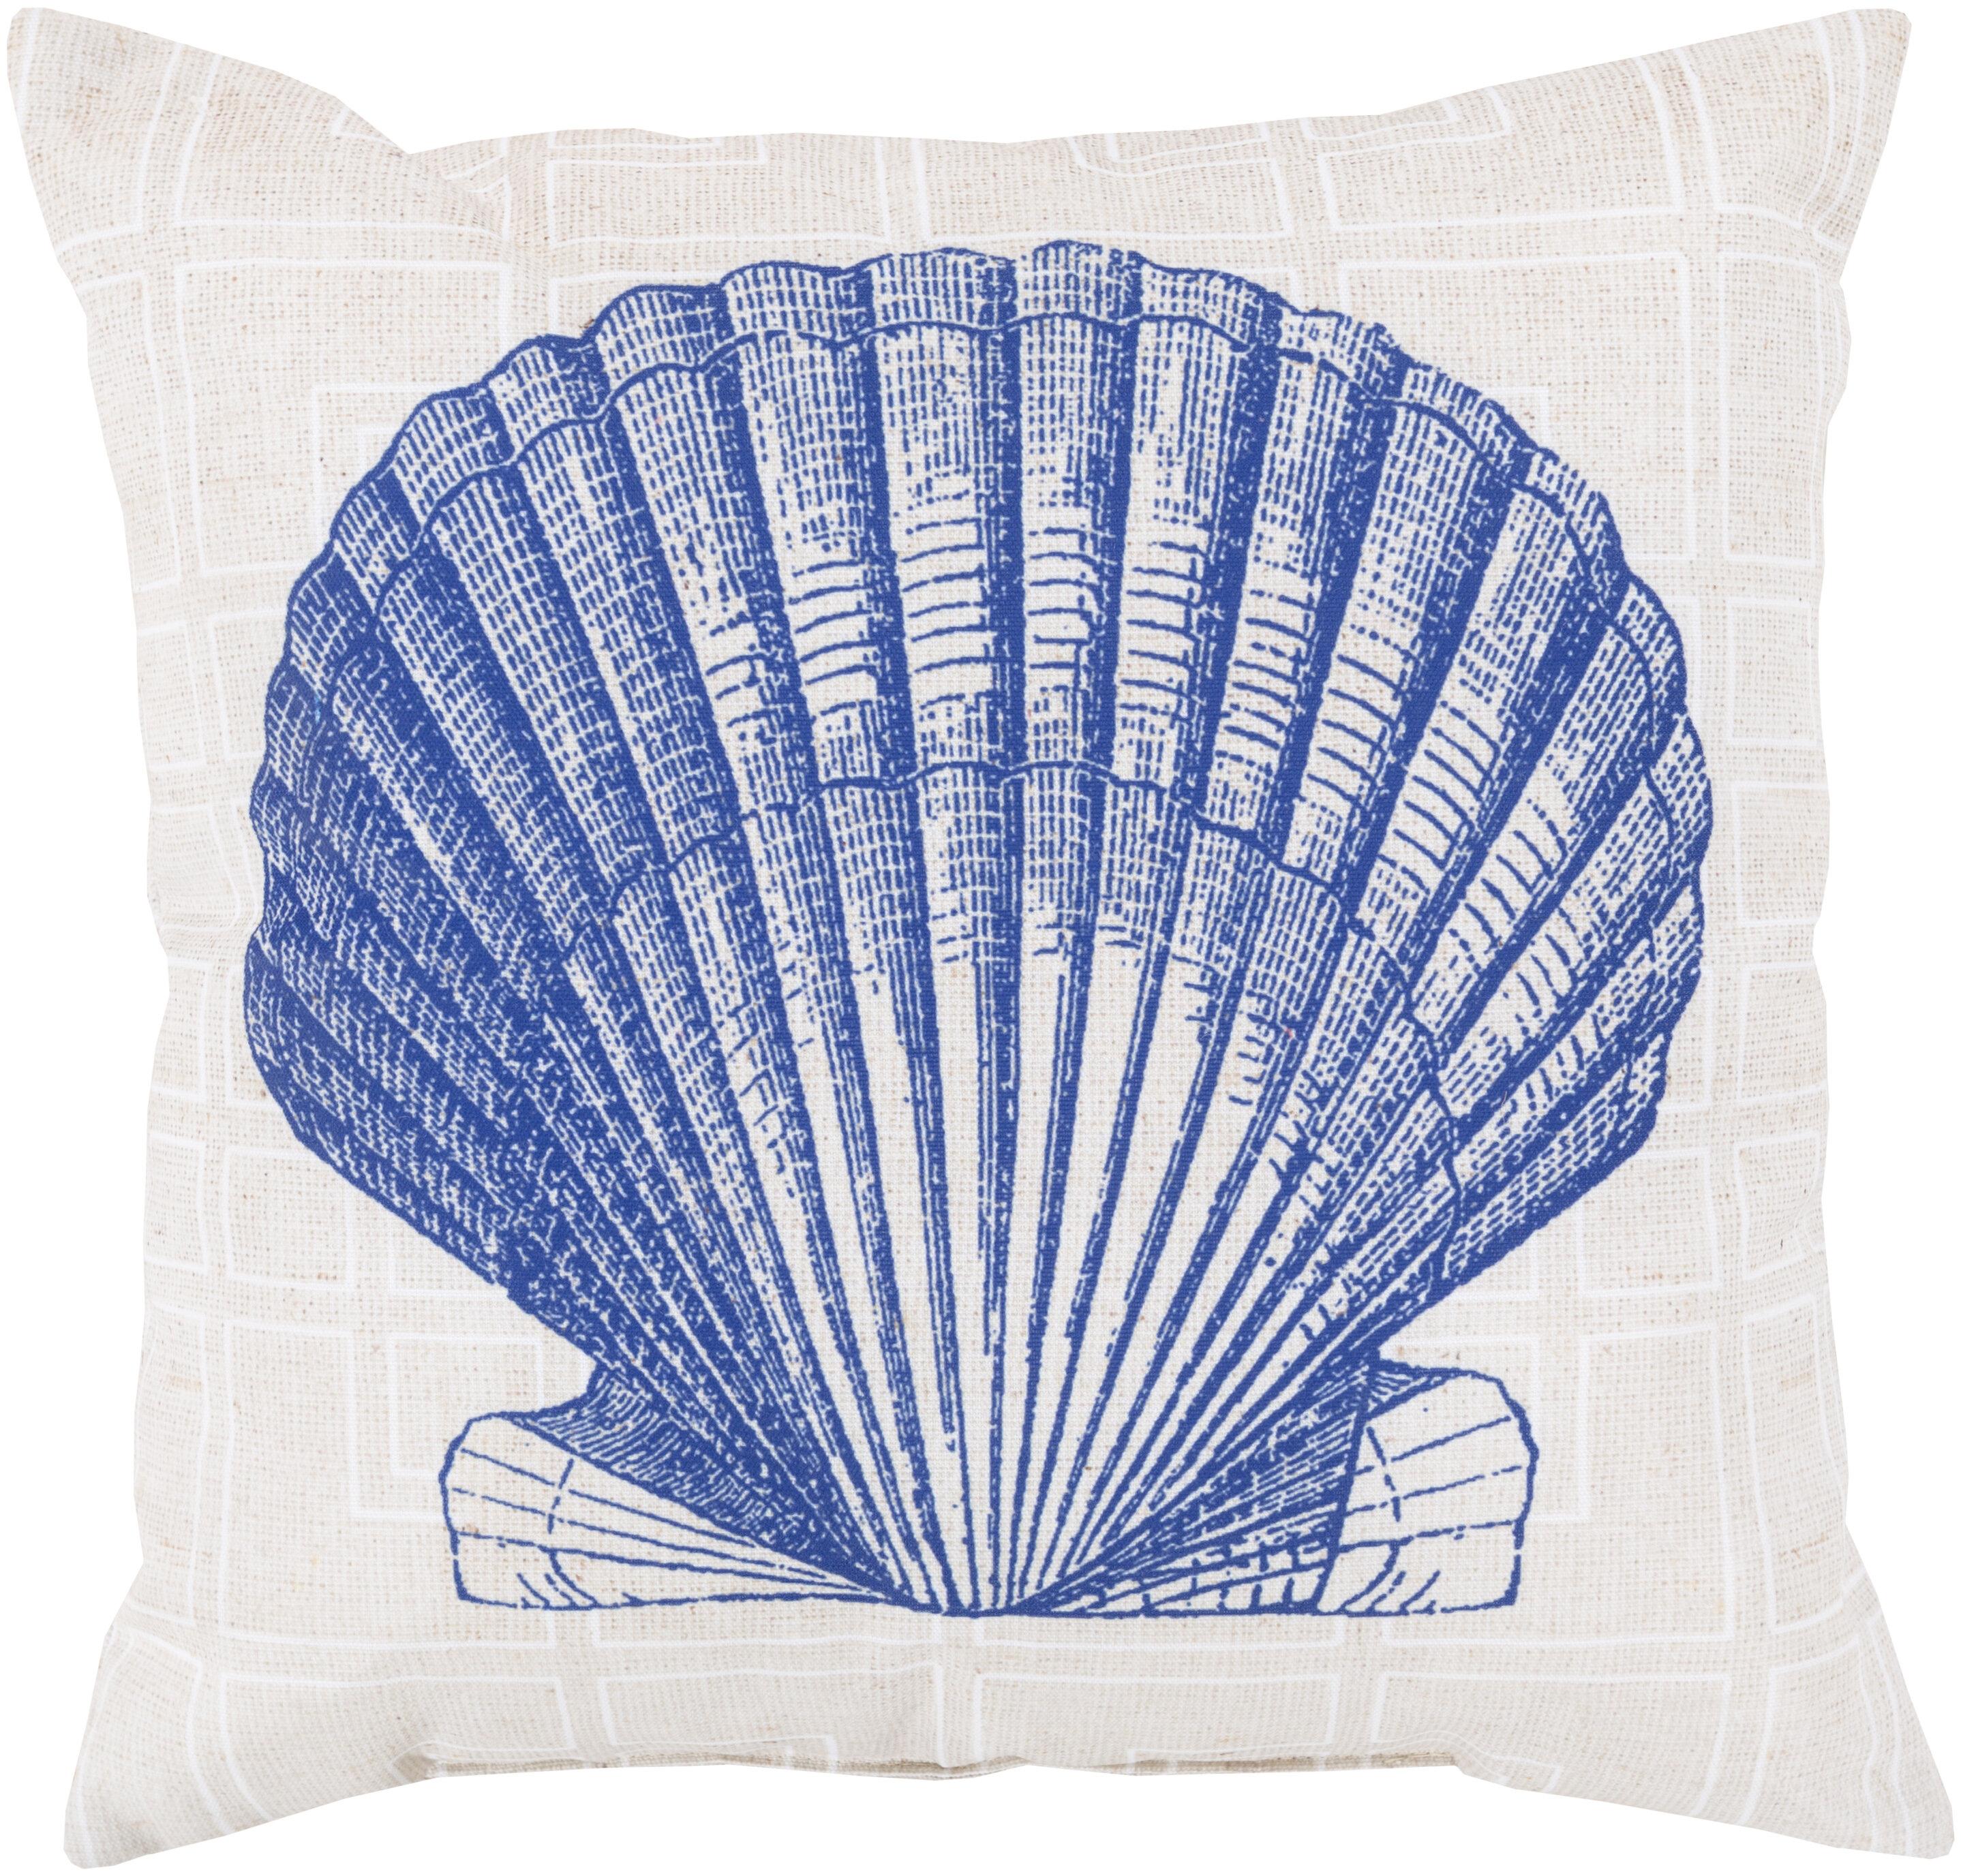 Highland Dunes Chaucer Shell Of The Sea Indoor Outdoor Throw Pillow Reviews Wayfair